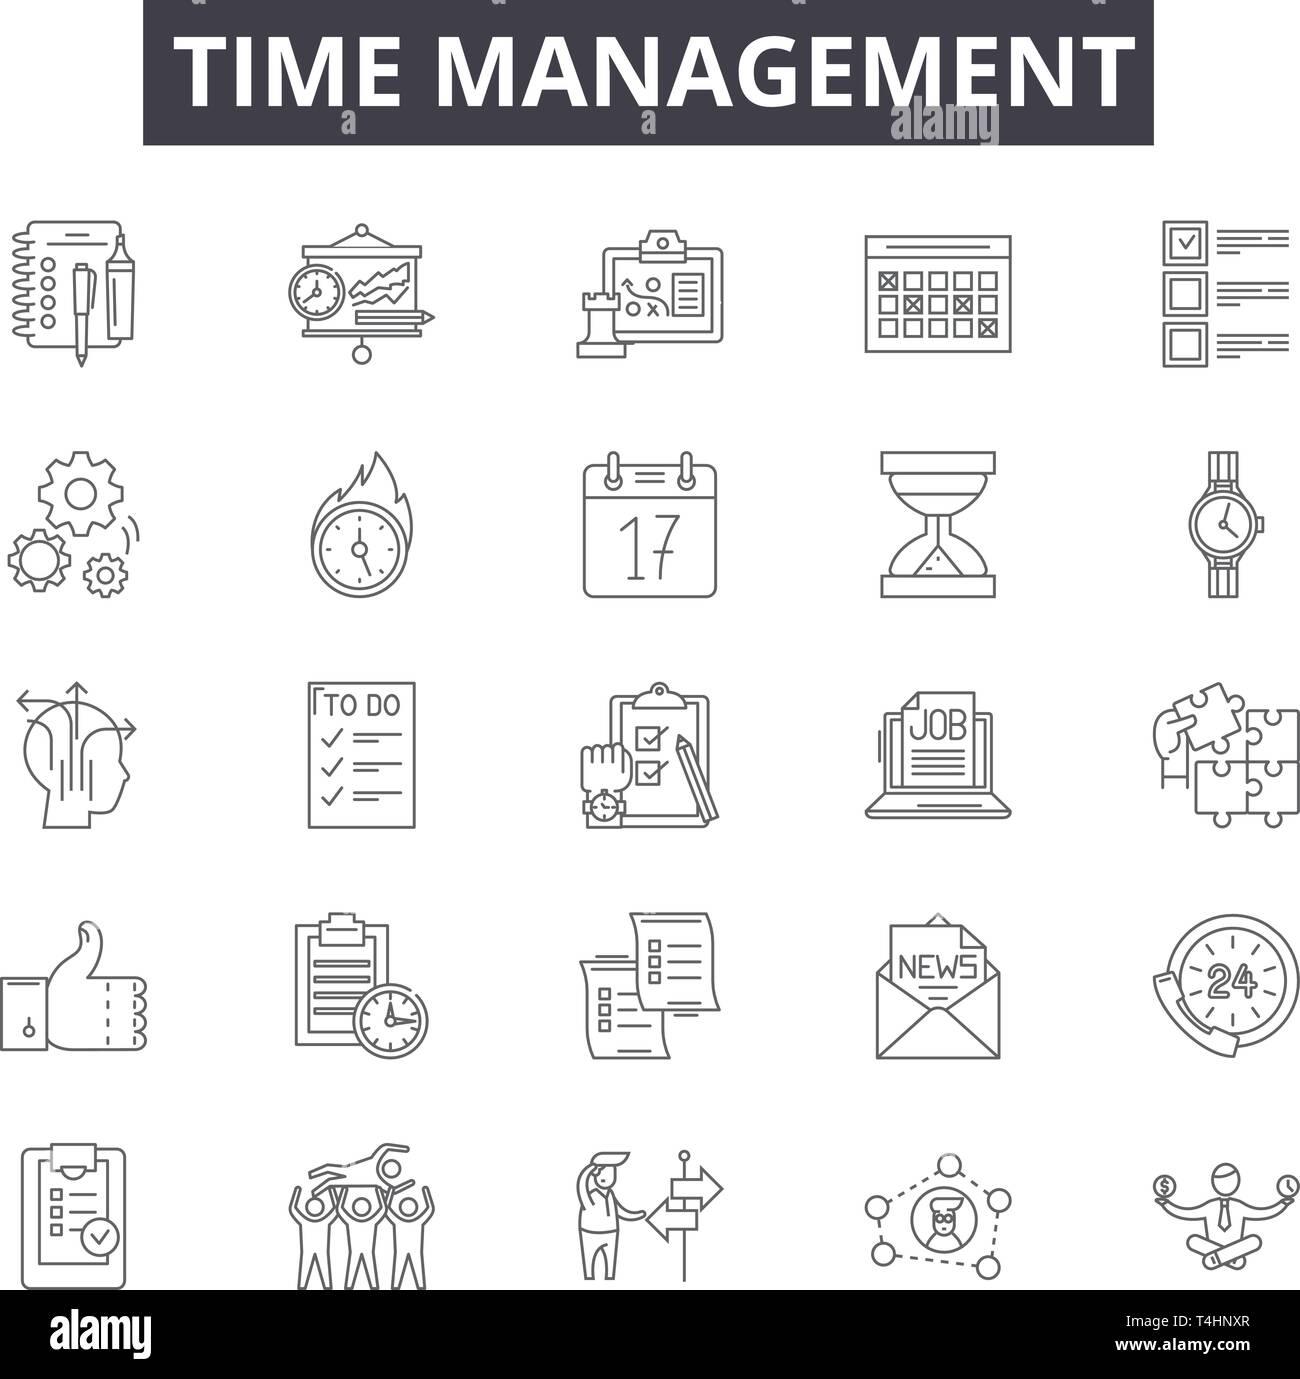 Time management line icons, signs set, vector. Time management outline concept, illustration: time,clock,management,schedule,business,concept - Stock Image